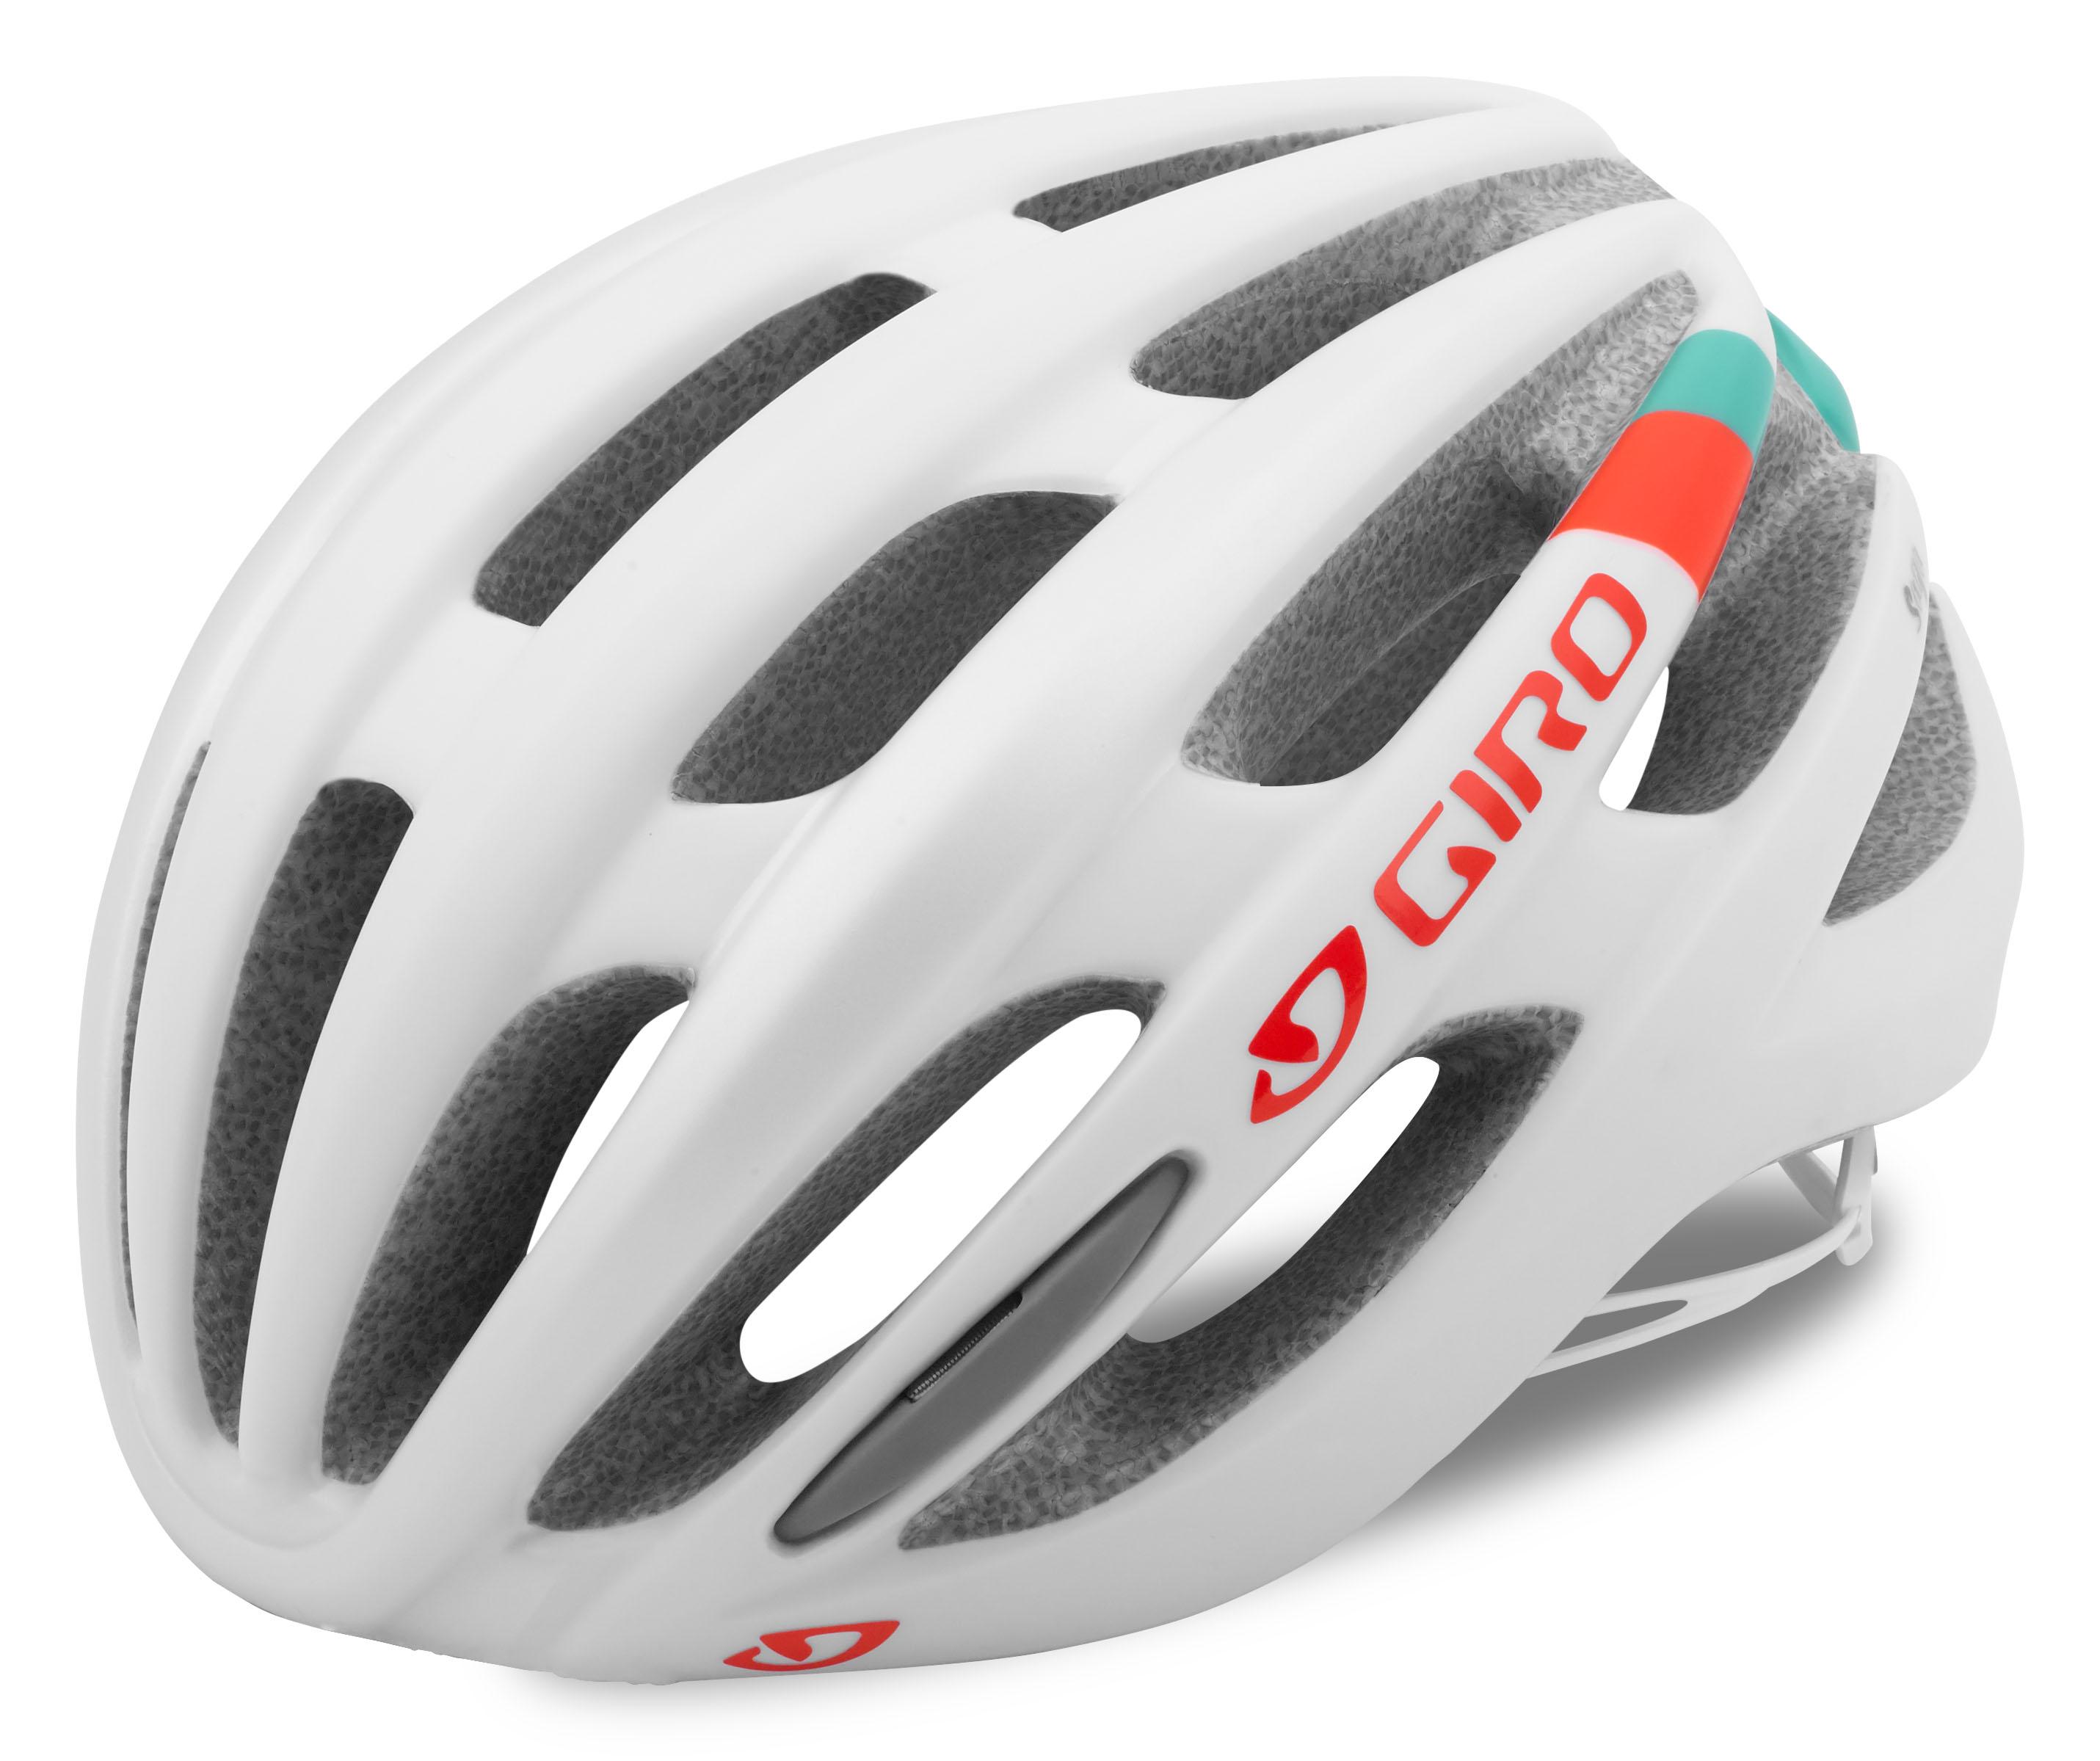 Giro cykelhjelm Saga Mat Hv/Tur/Vmn S Women MATHVID S/51-55cm | Helmets